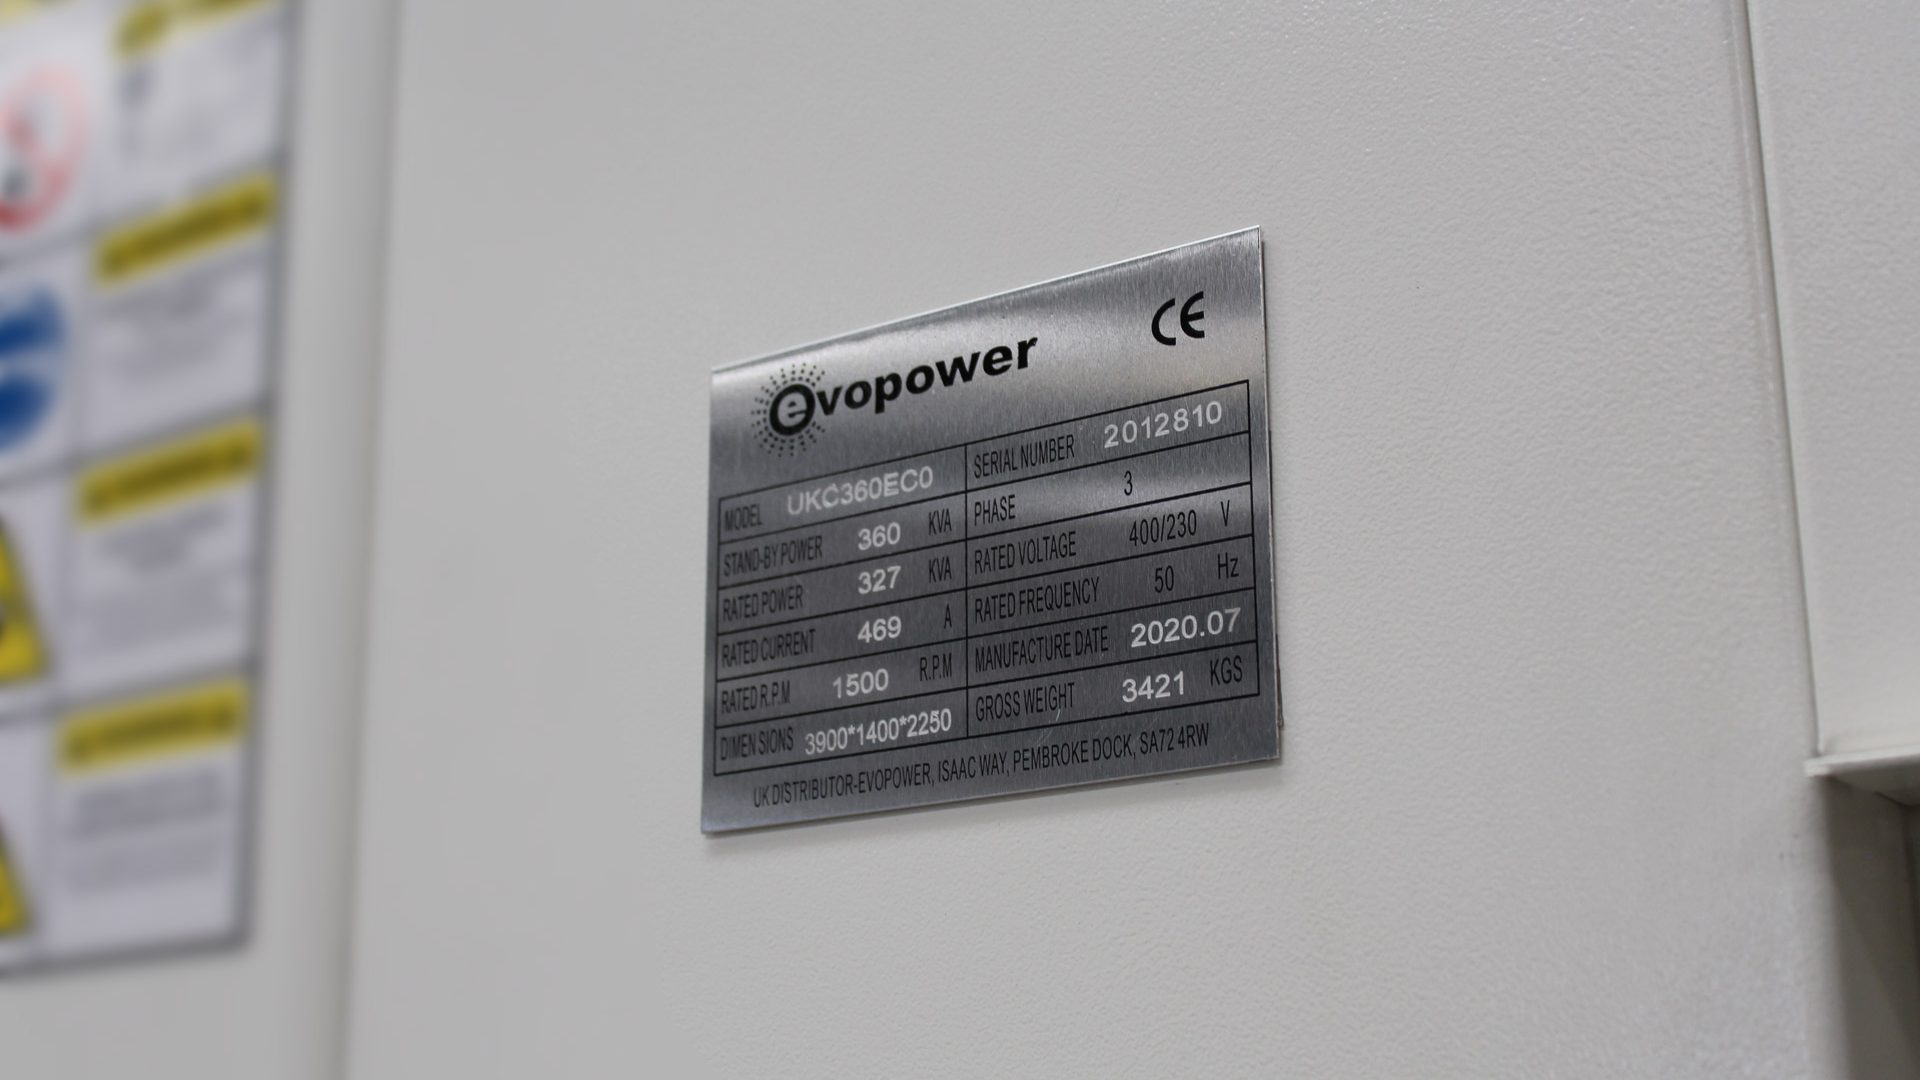 UKC360ECO Generator Spec Plate